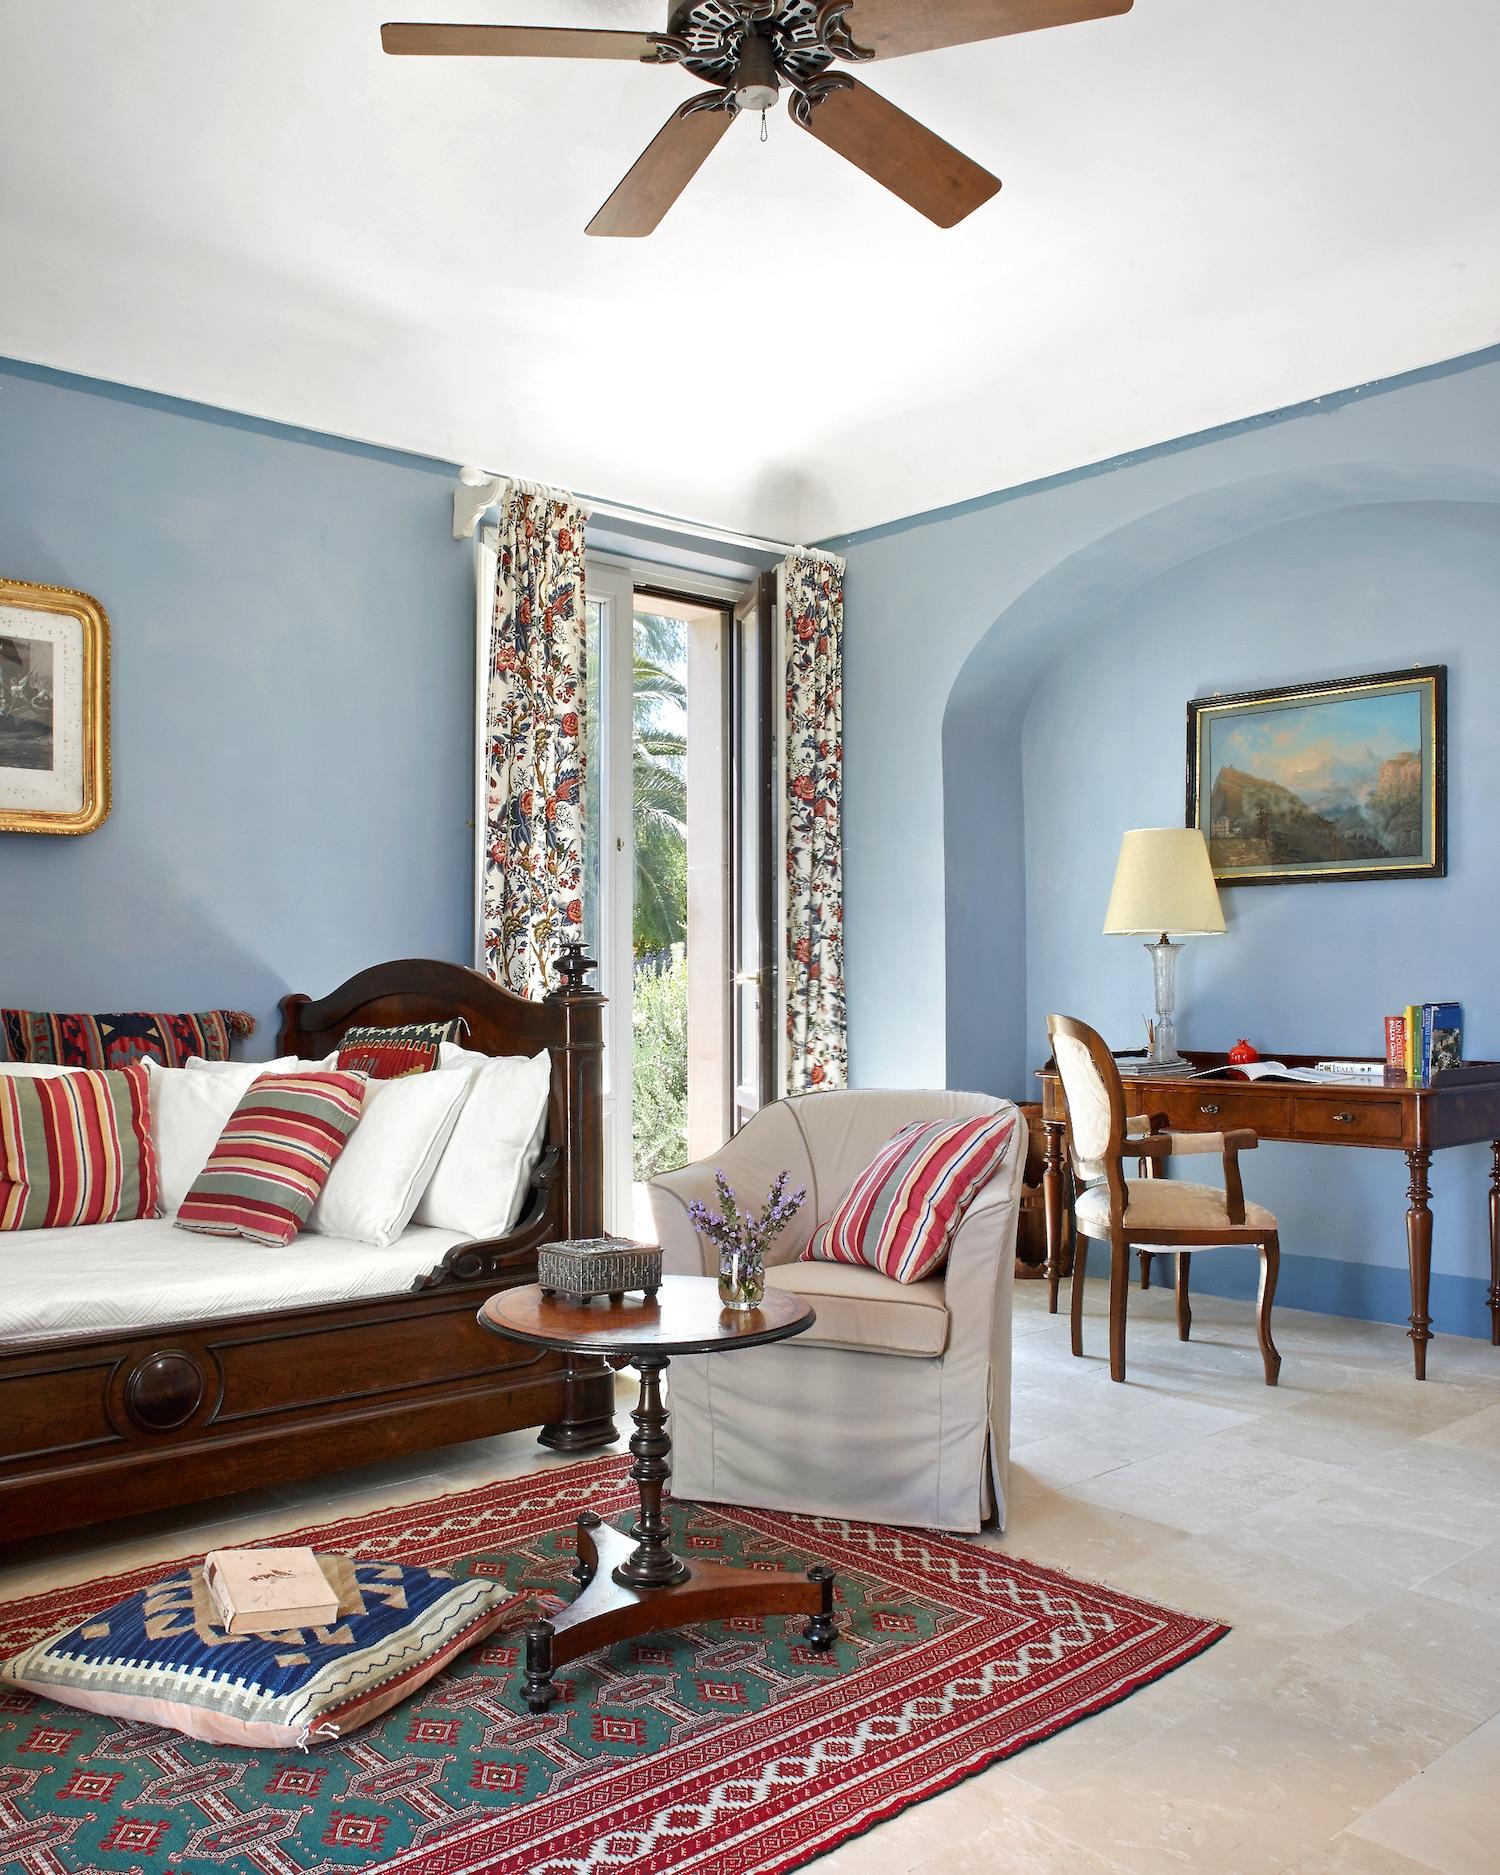 VILLA ARANJAYA 088-Lavanda Suite.jpg